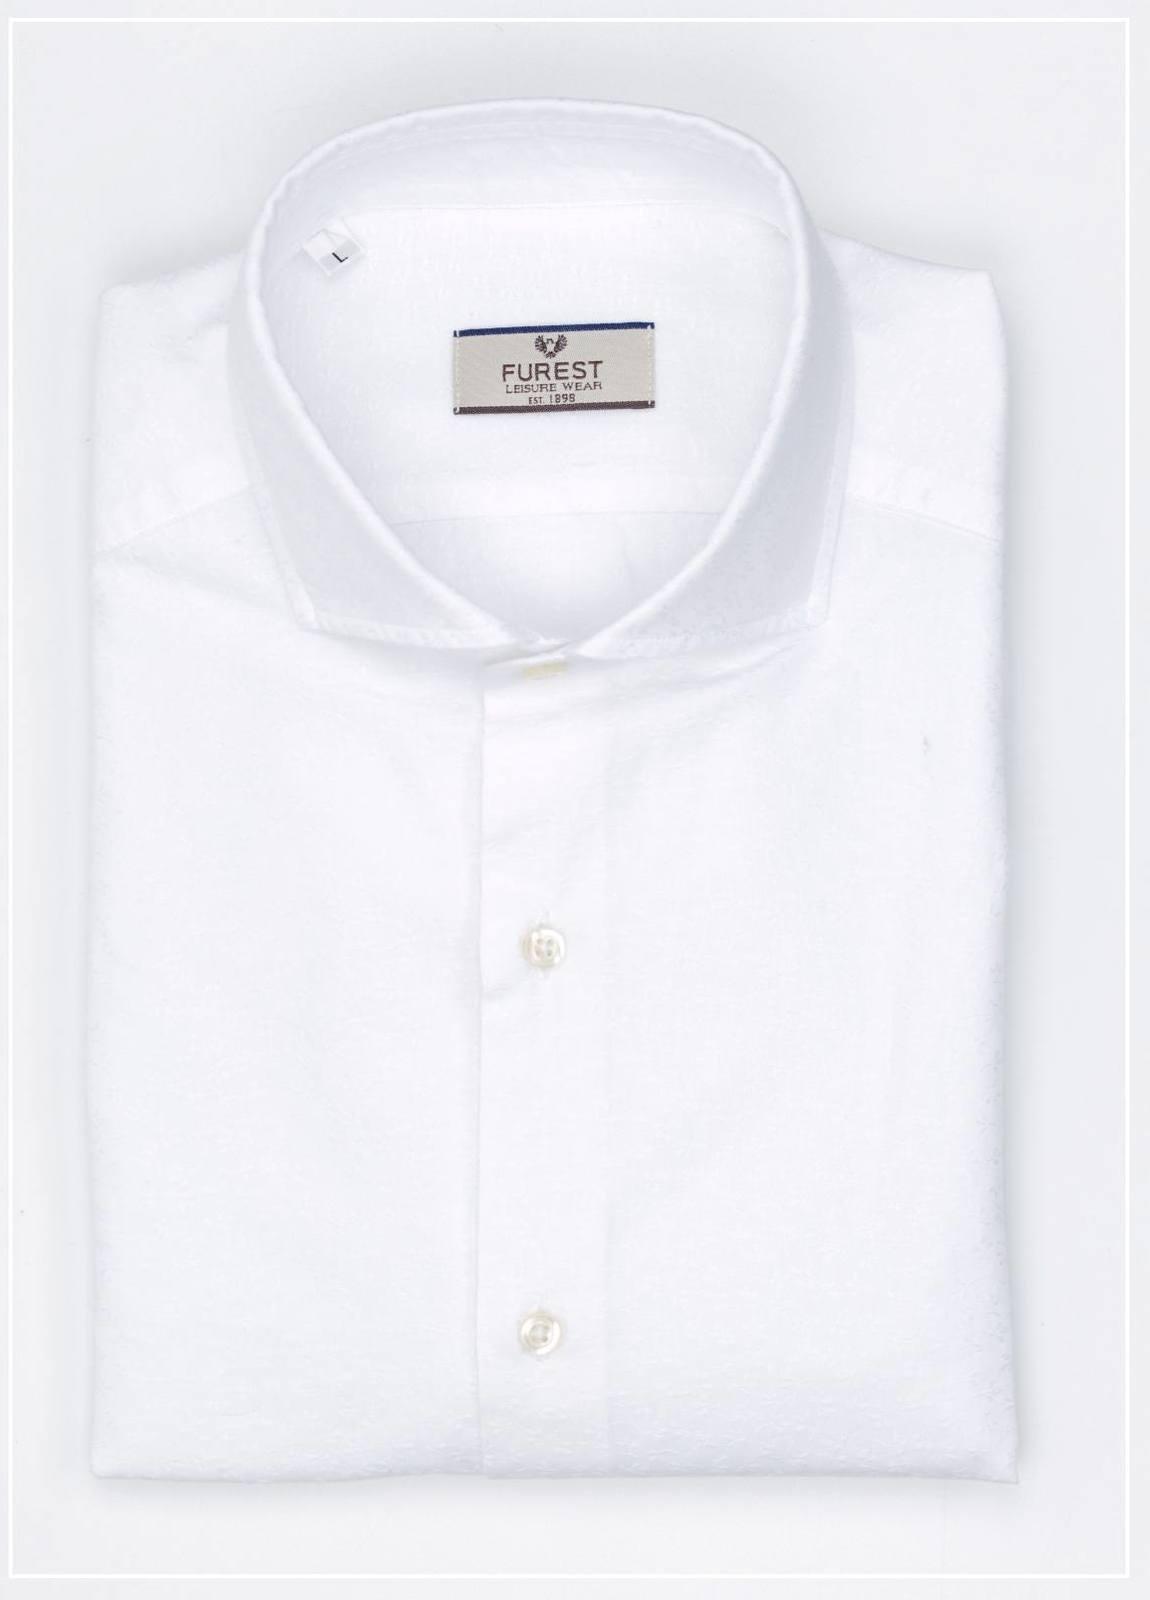 Camisa Leisure Wear SLIM FIT Modelo CAPRI diseño microdibujo color blanco,100% Algodón.